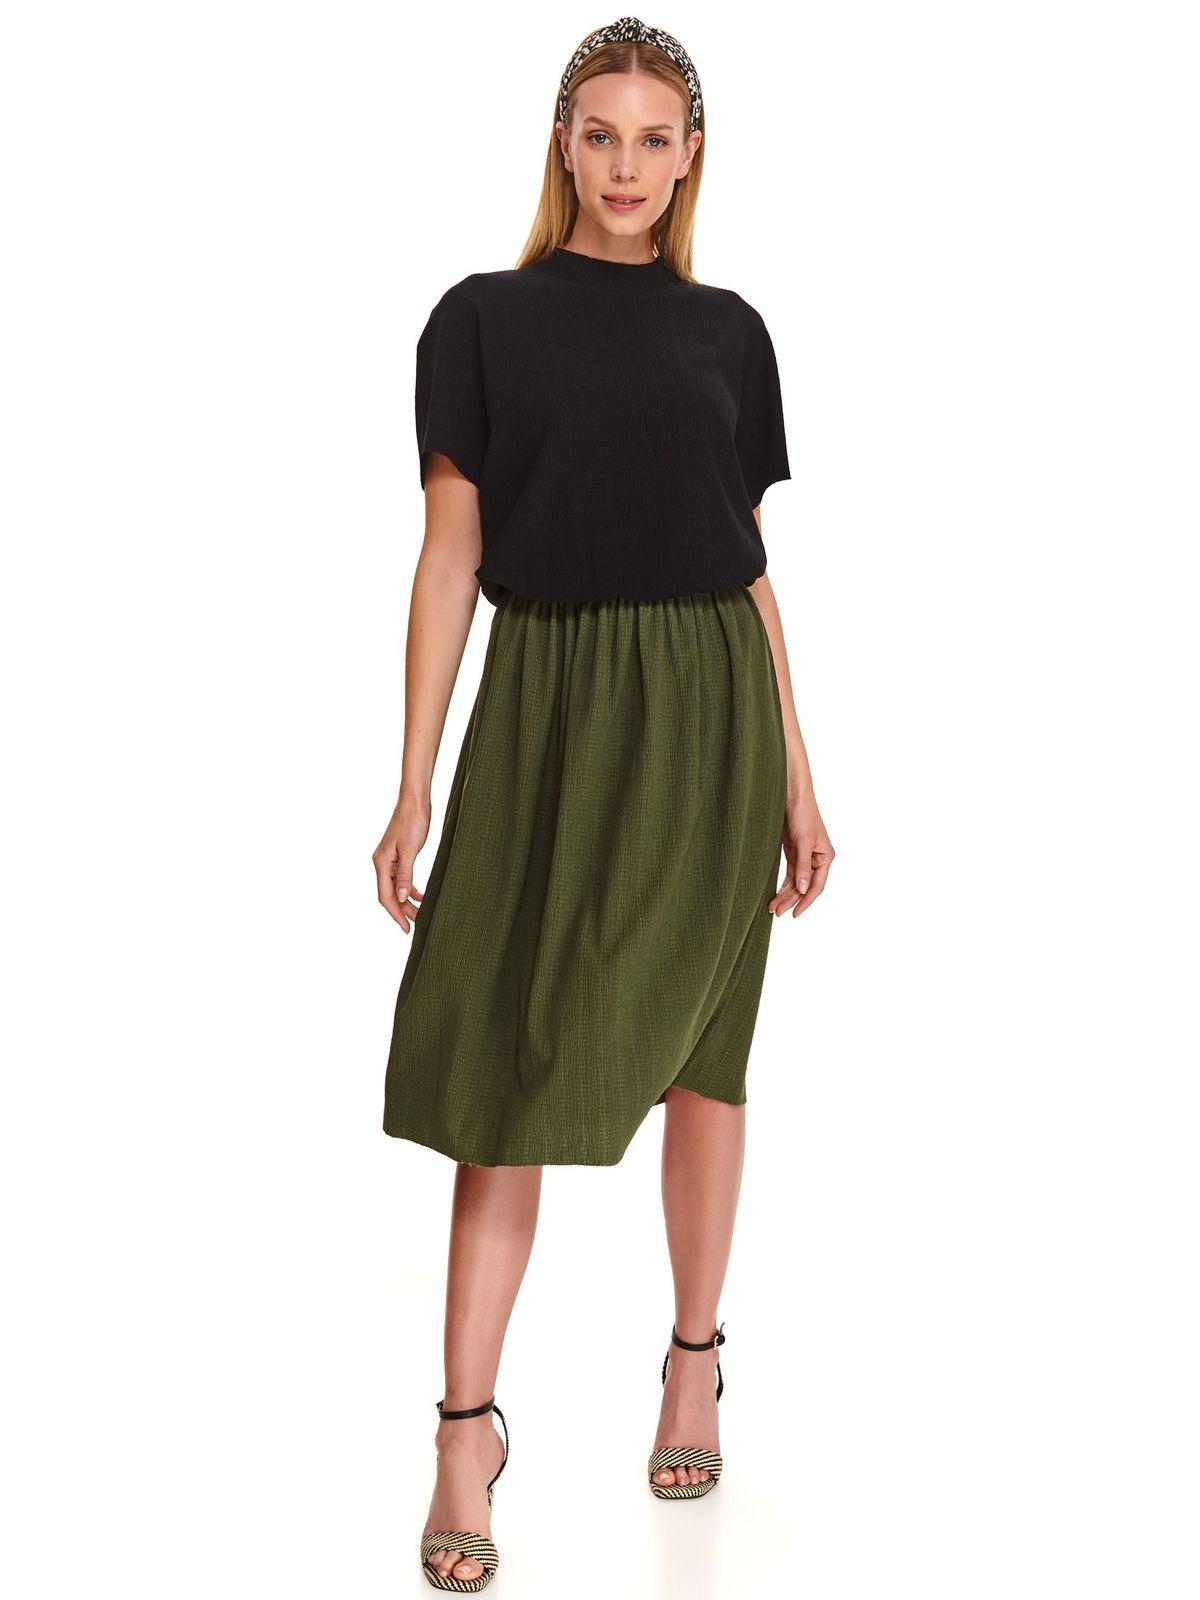 Green skirt casual midi thin fabric high waisted